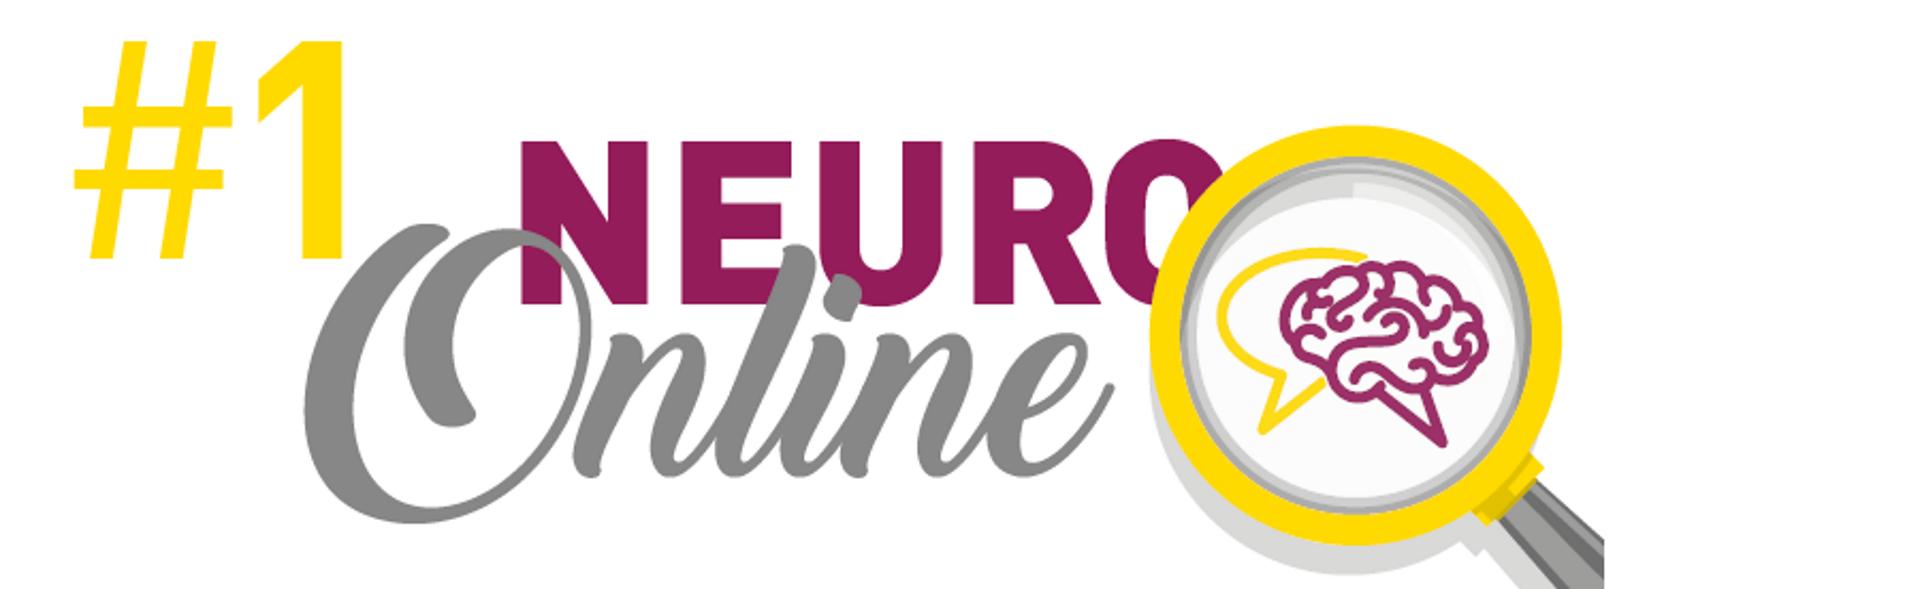 Neuronline banner